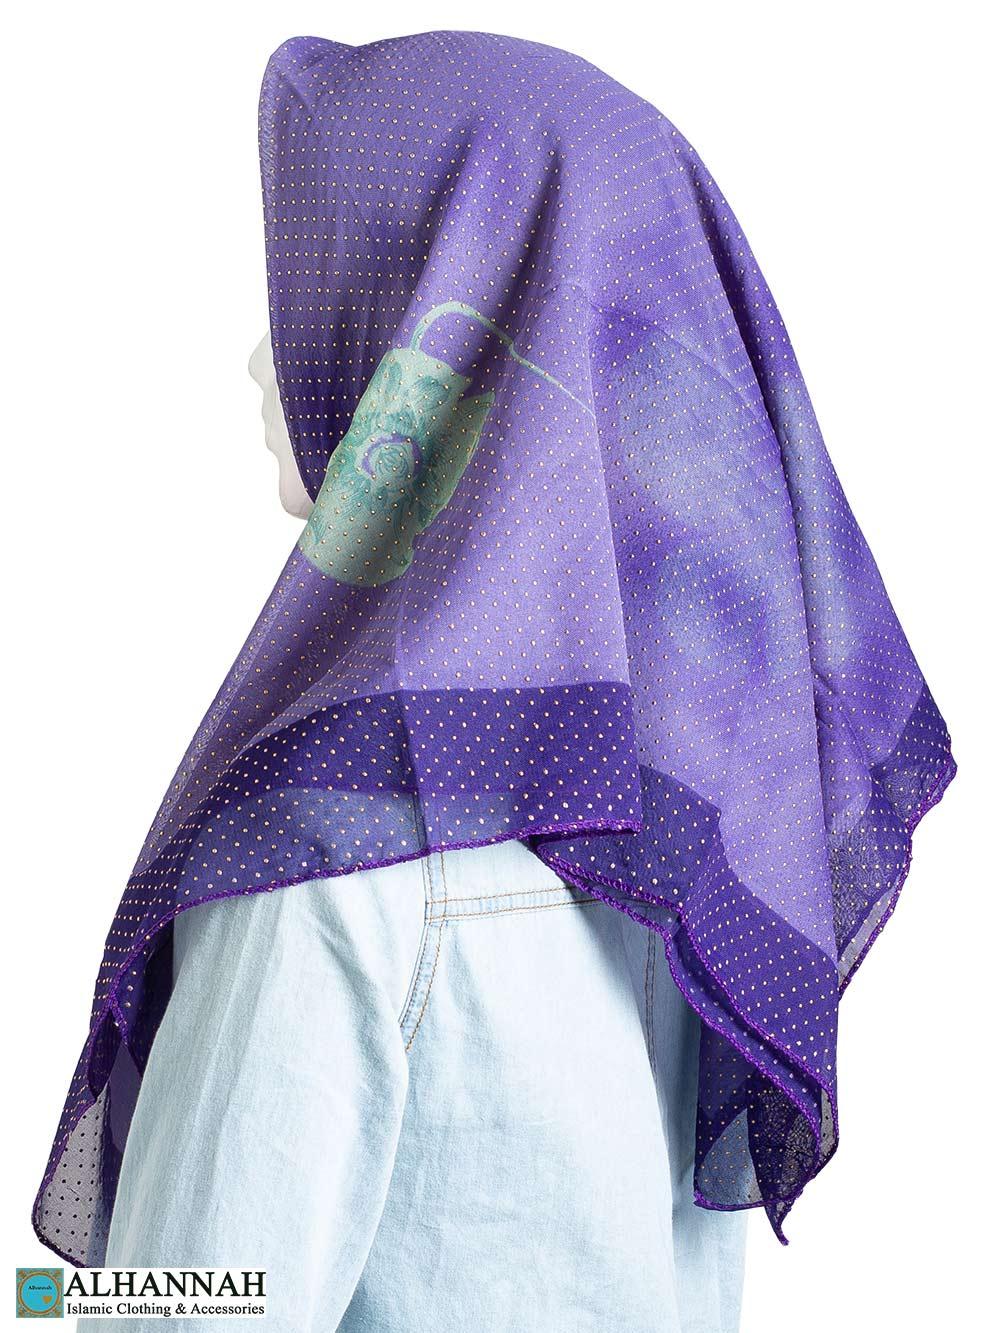 Hibiscus Beaded Square Hijab hi2326